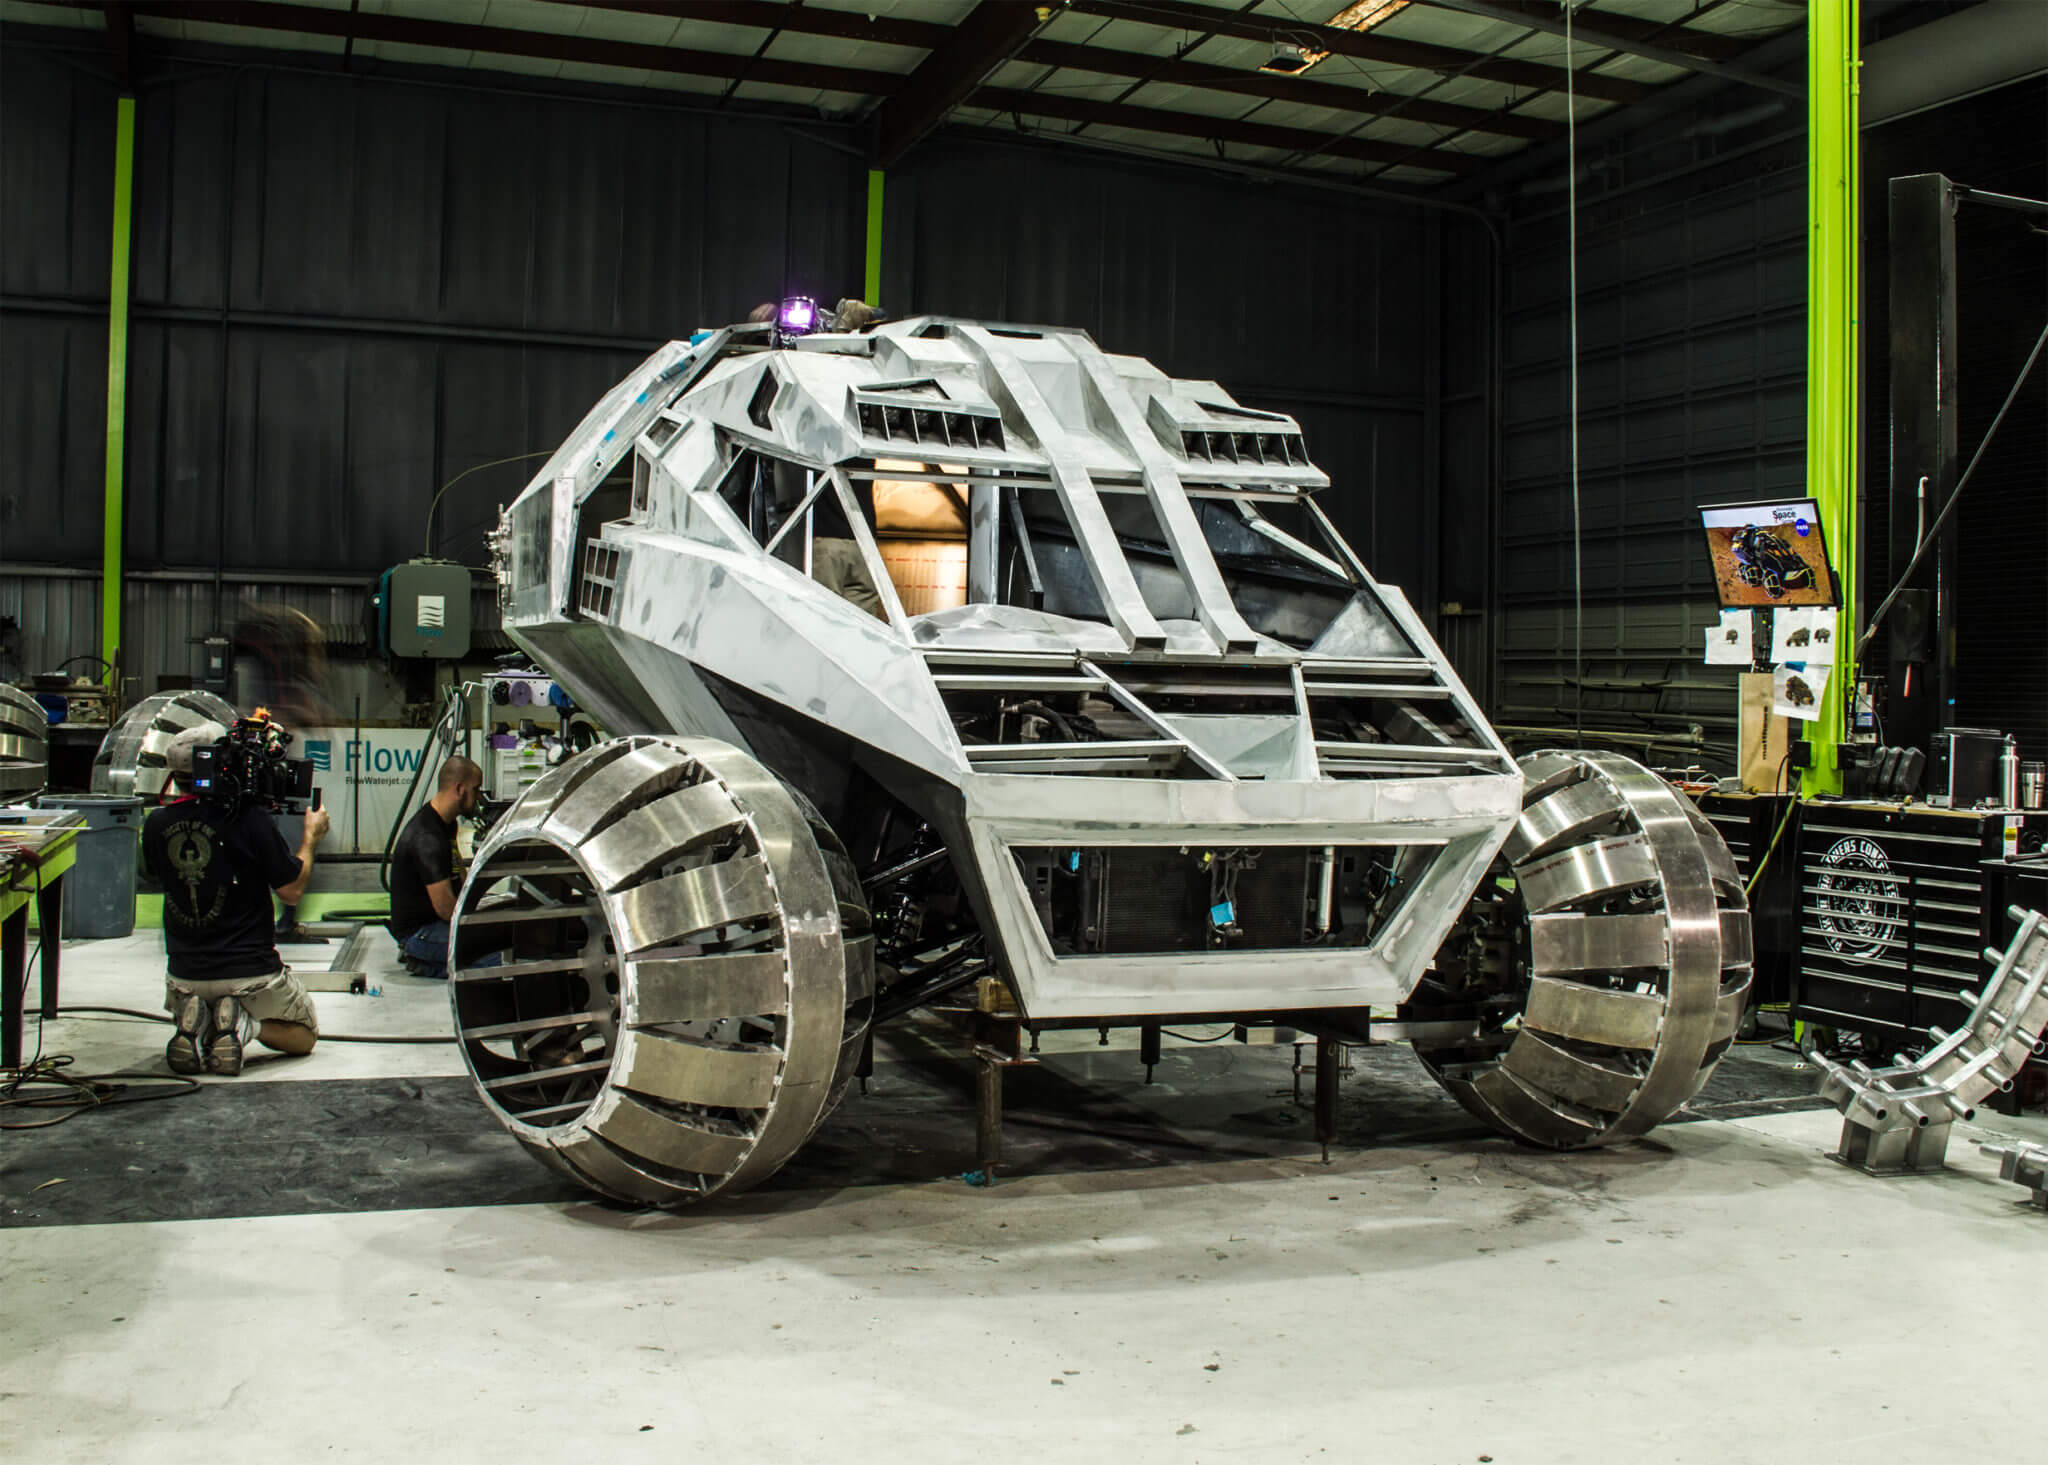 mars exploration rover news - photo #25